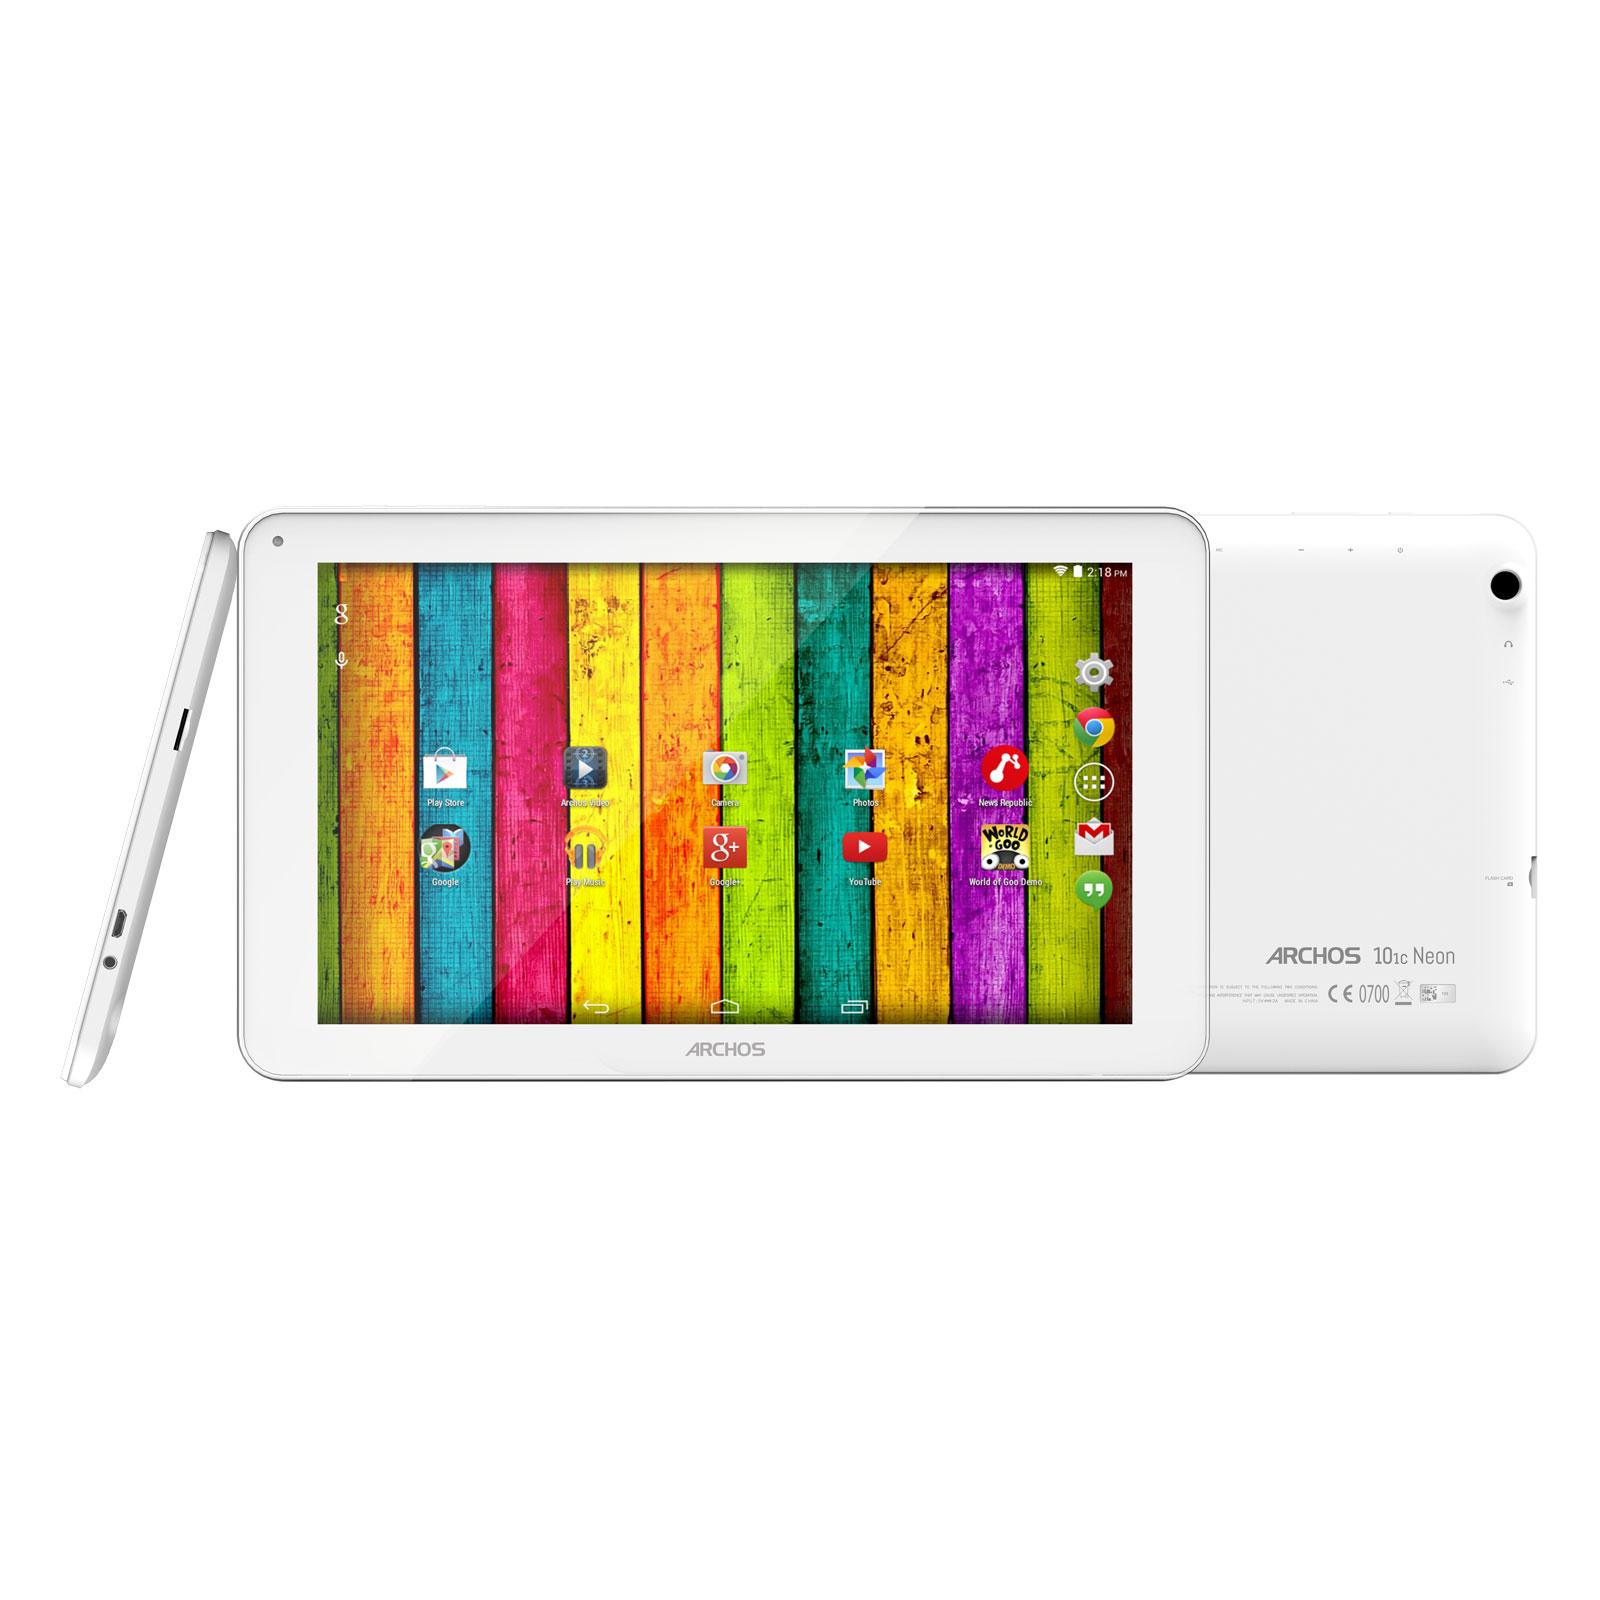 archos 101c neon 16 go 502805 achat vente tablette. Black Bedroom Furniture Sets. Home Design Ideas